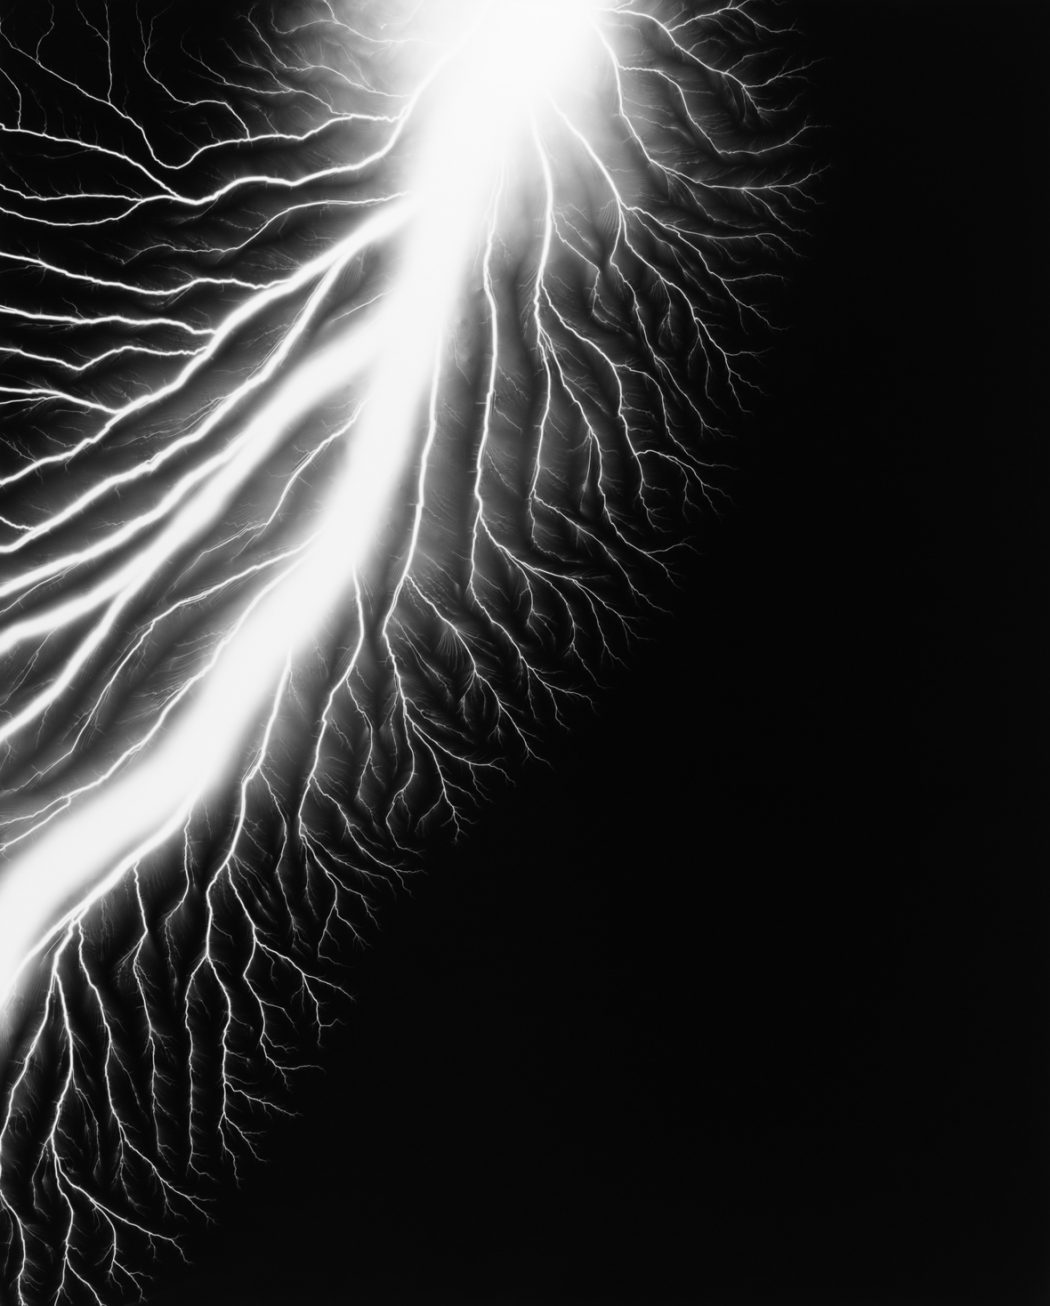 resized-hiroshi-sugimoto-lightning-fields-226